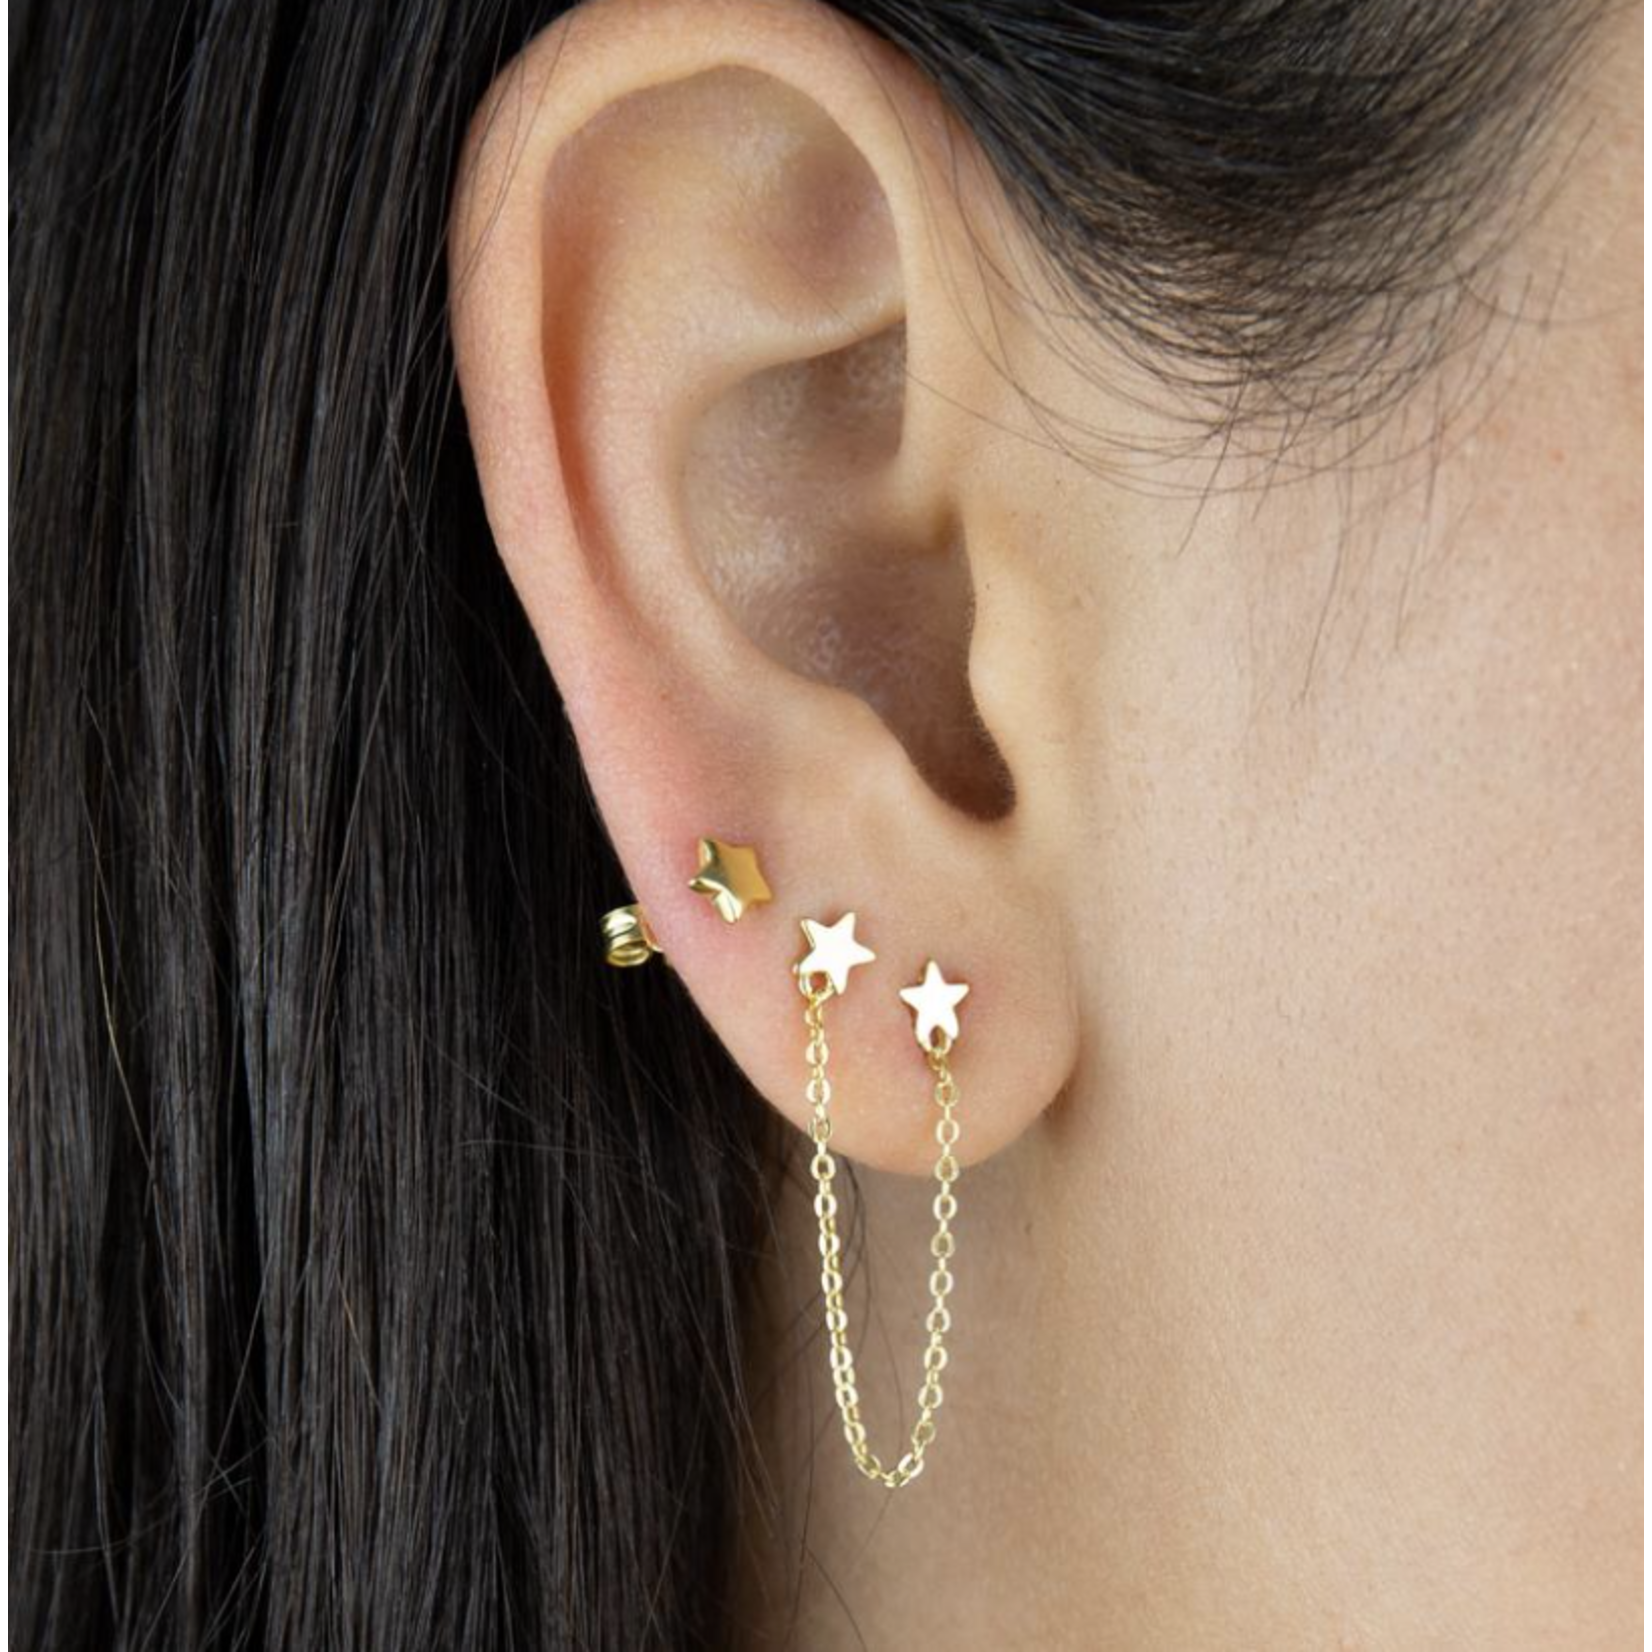 Adinas Double Star Chain Stud Earring